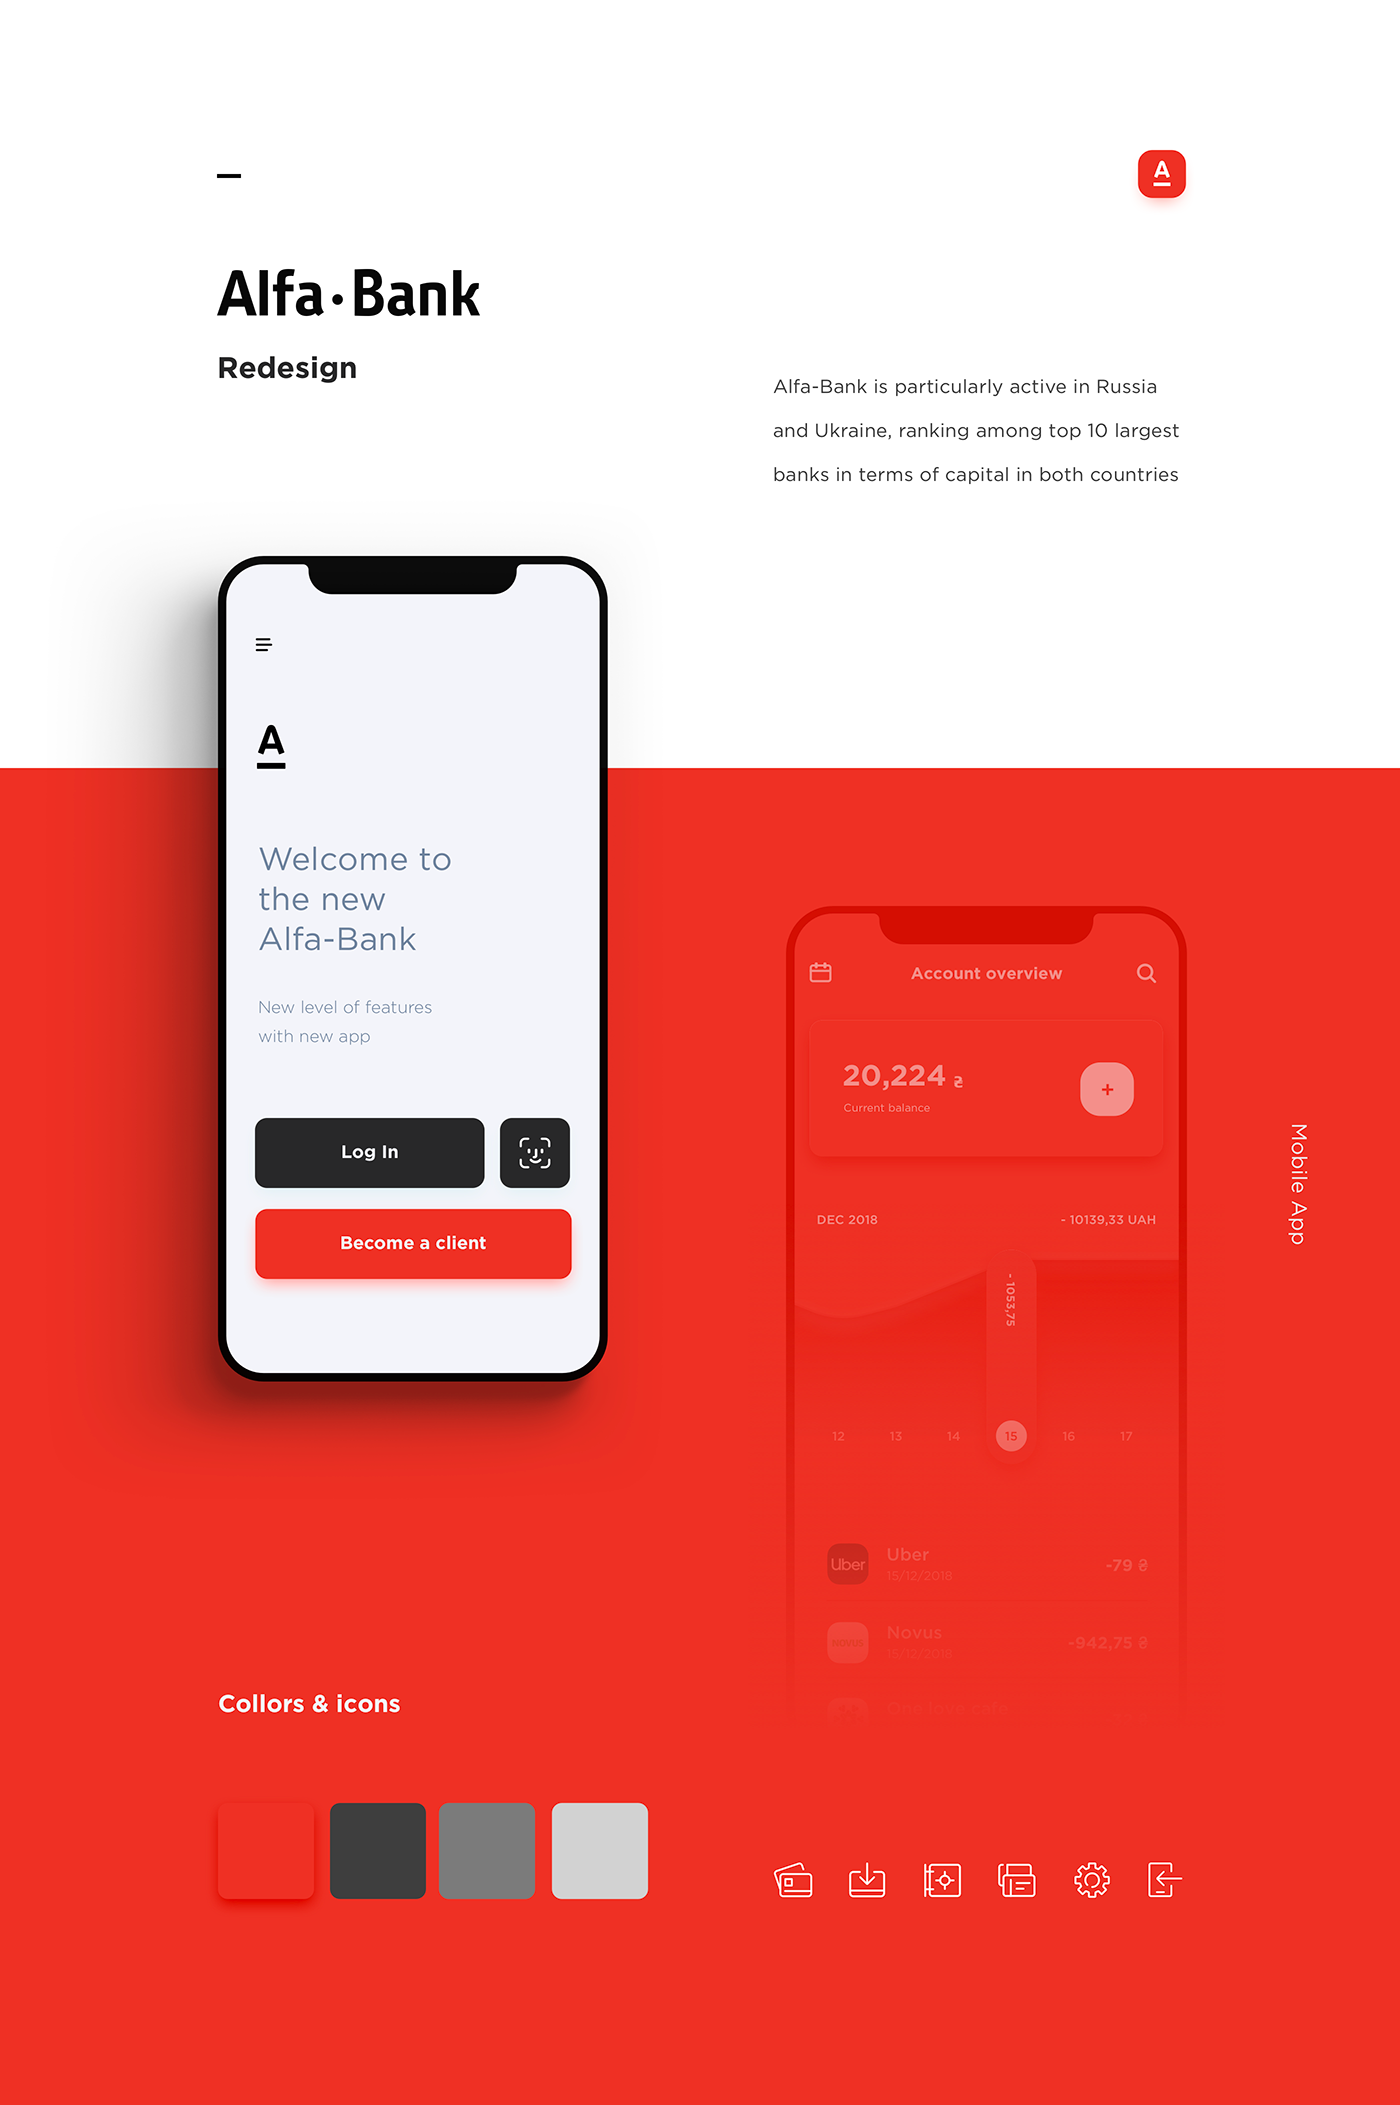 abduzeedo.com - Redesigning the Alfa Bank mobile app